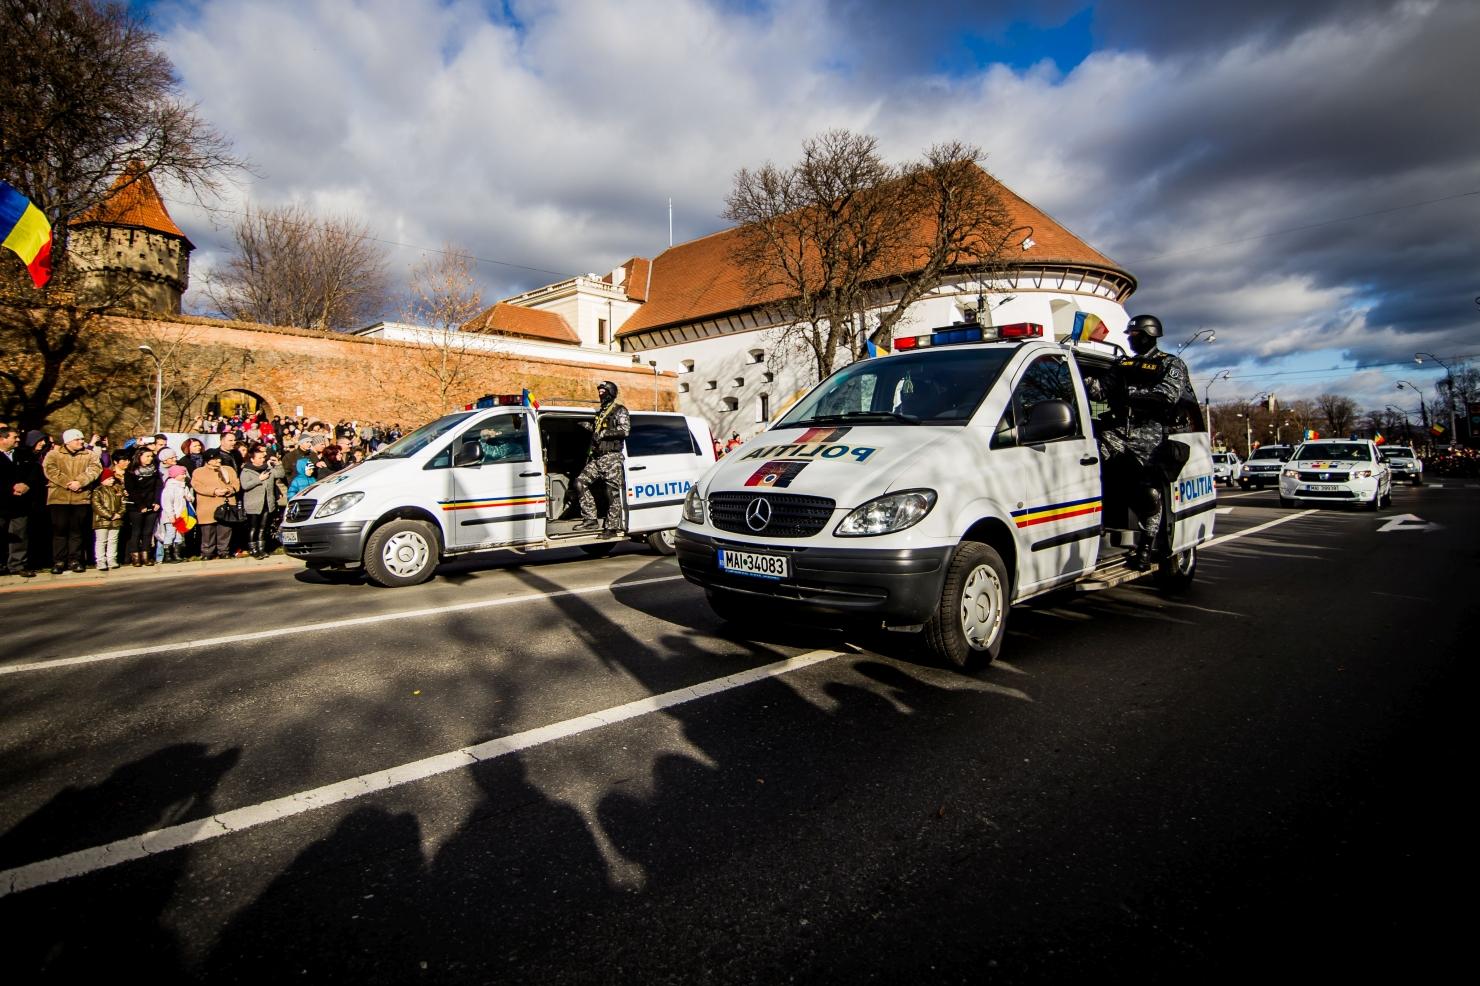 Parada de Ziua Națională la Sibiu